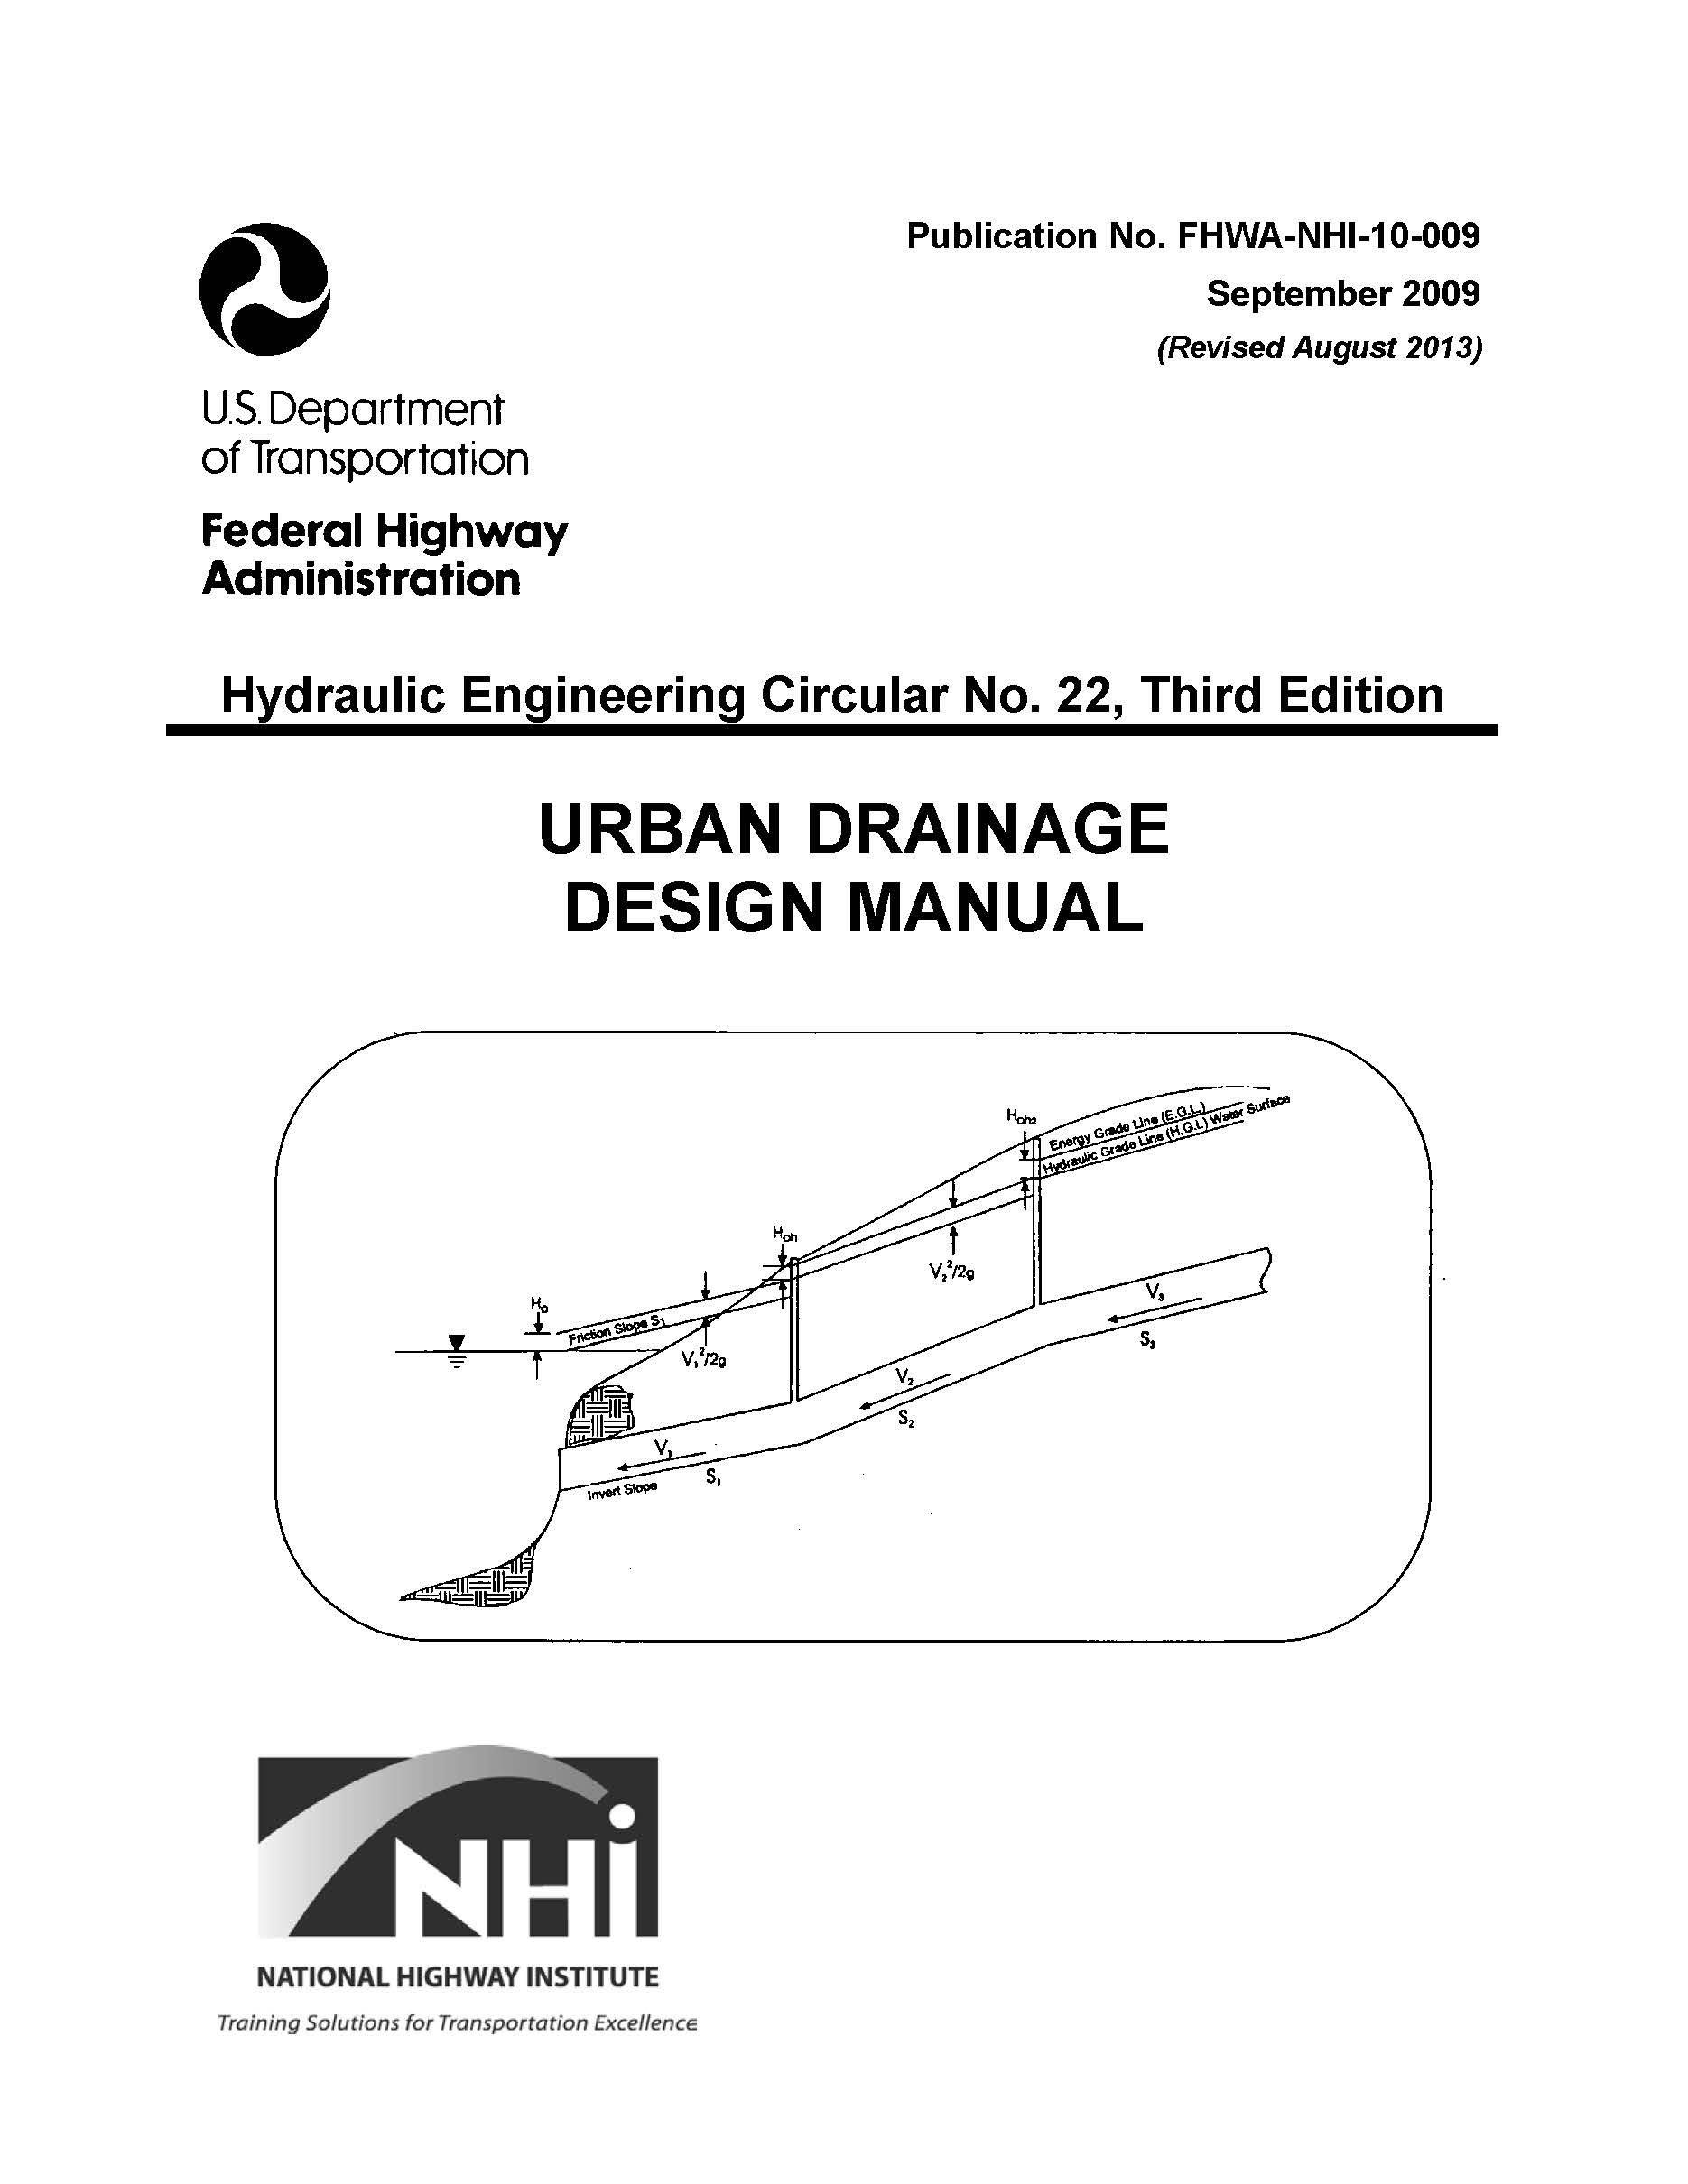 Read Online FHWA-NHI-10-009 URBAN DRAINAGE DESIGN MANUAL. Hydraulic Engineering Circular No. 22, Third Edition. September 2009 PDF